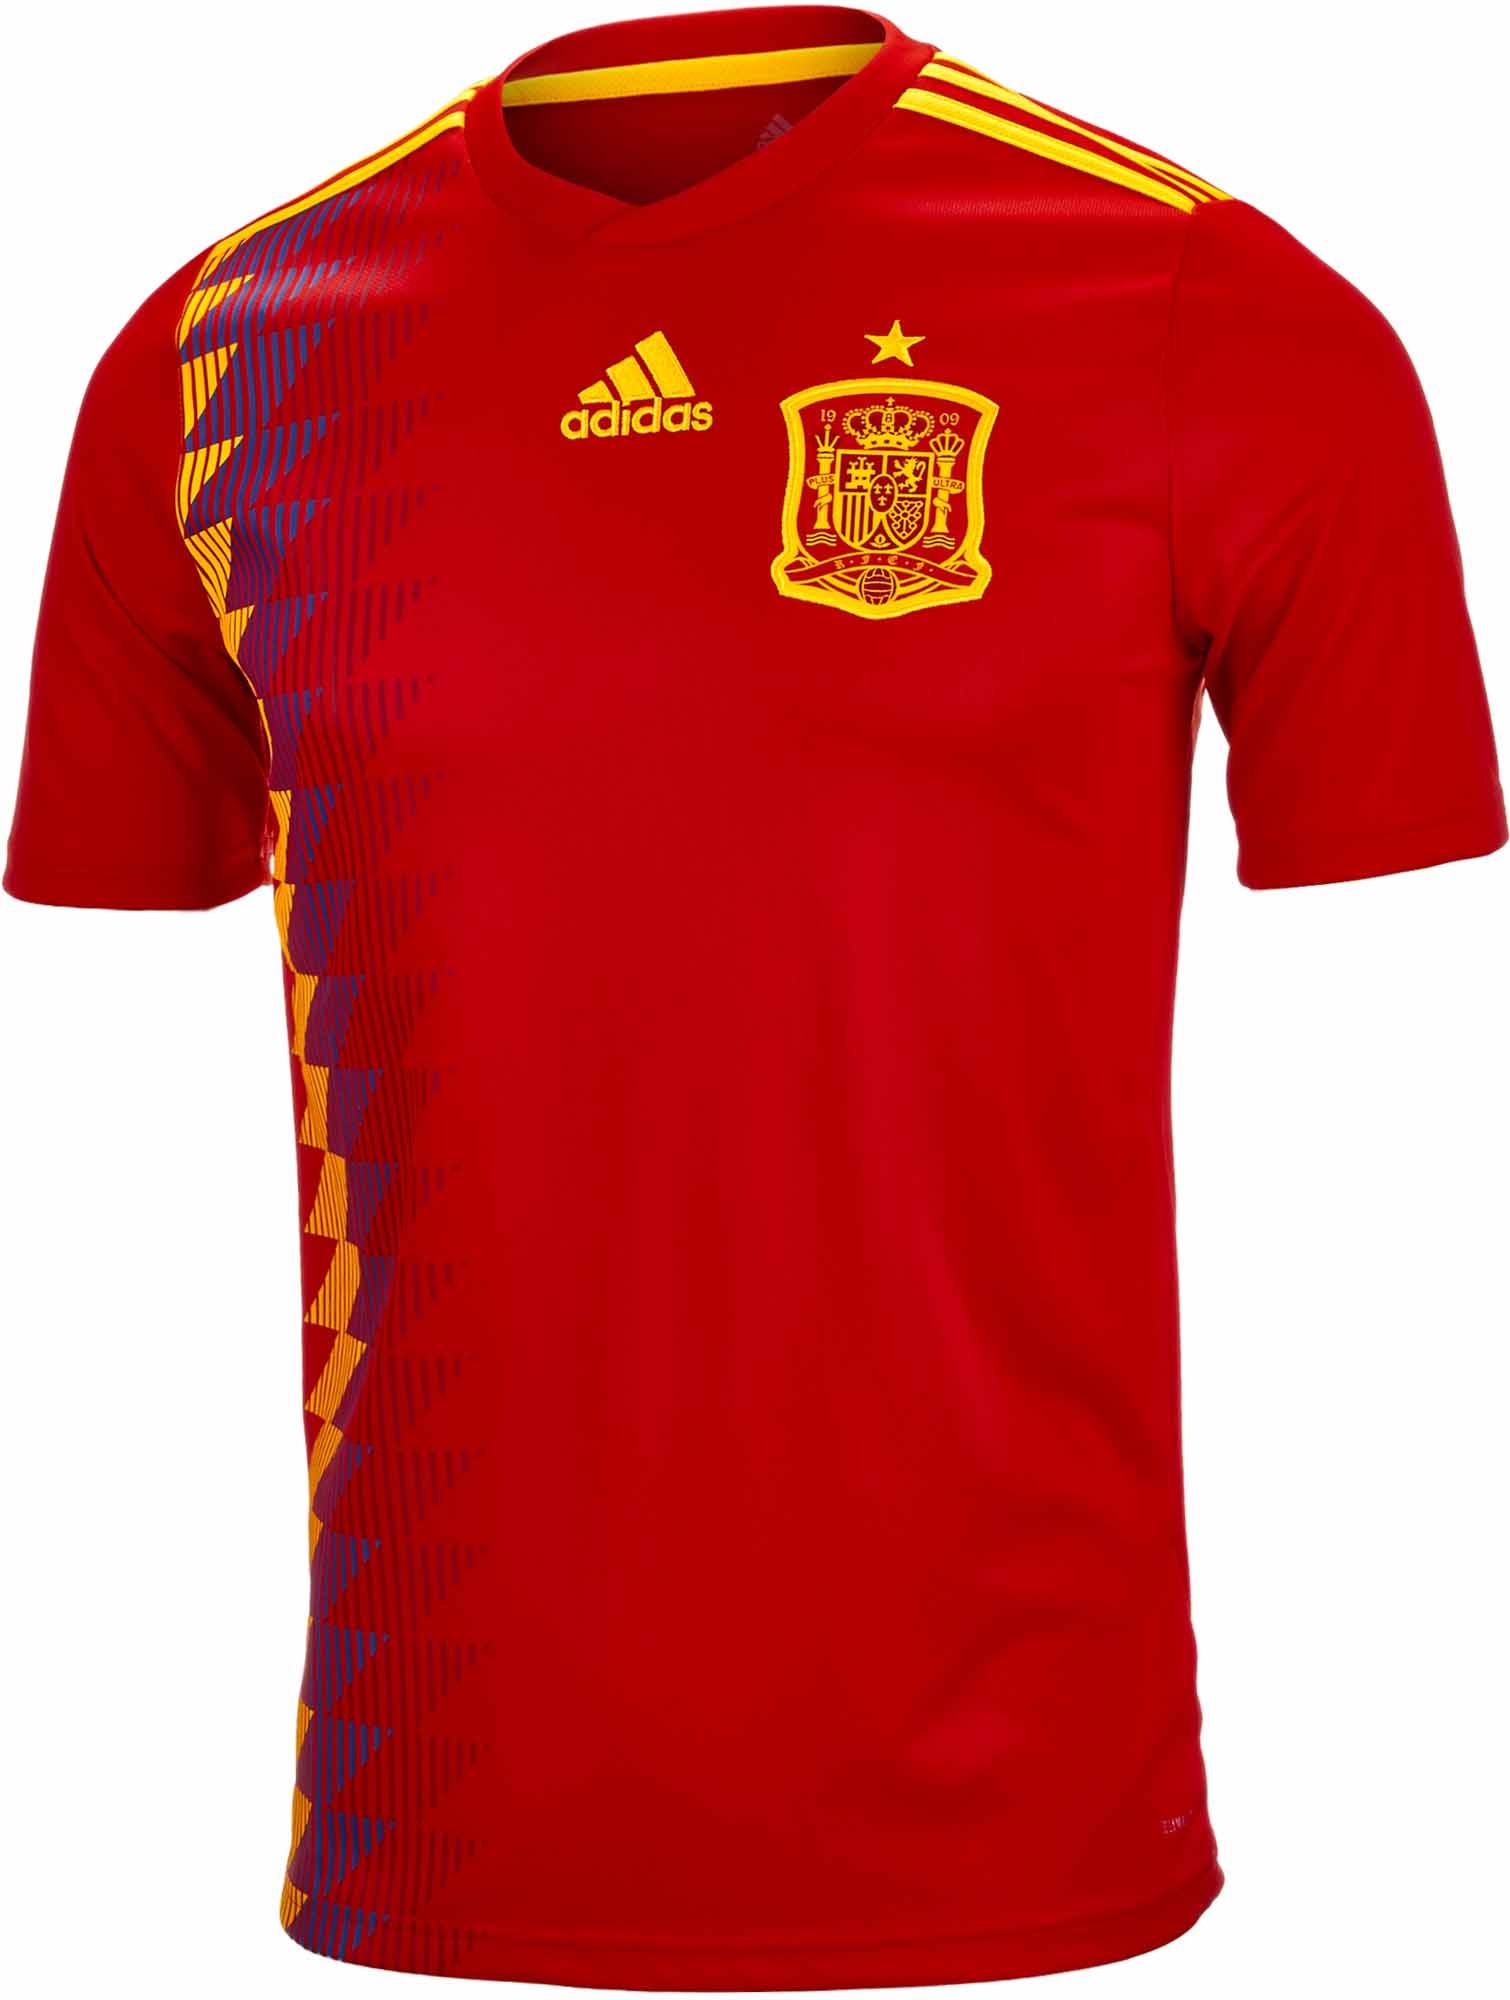 adidas Kids Spain Home Jersey 2018-19 - SoccerPro.com 6f2f0dfdd